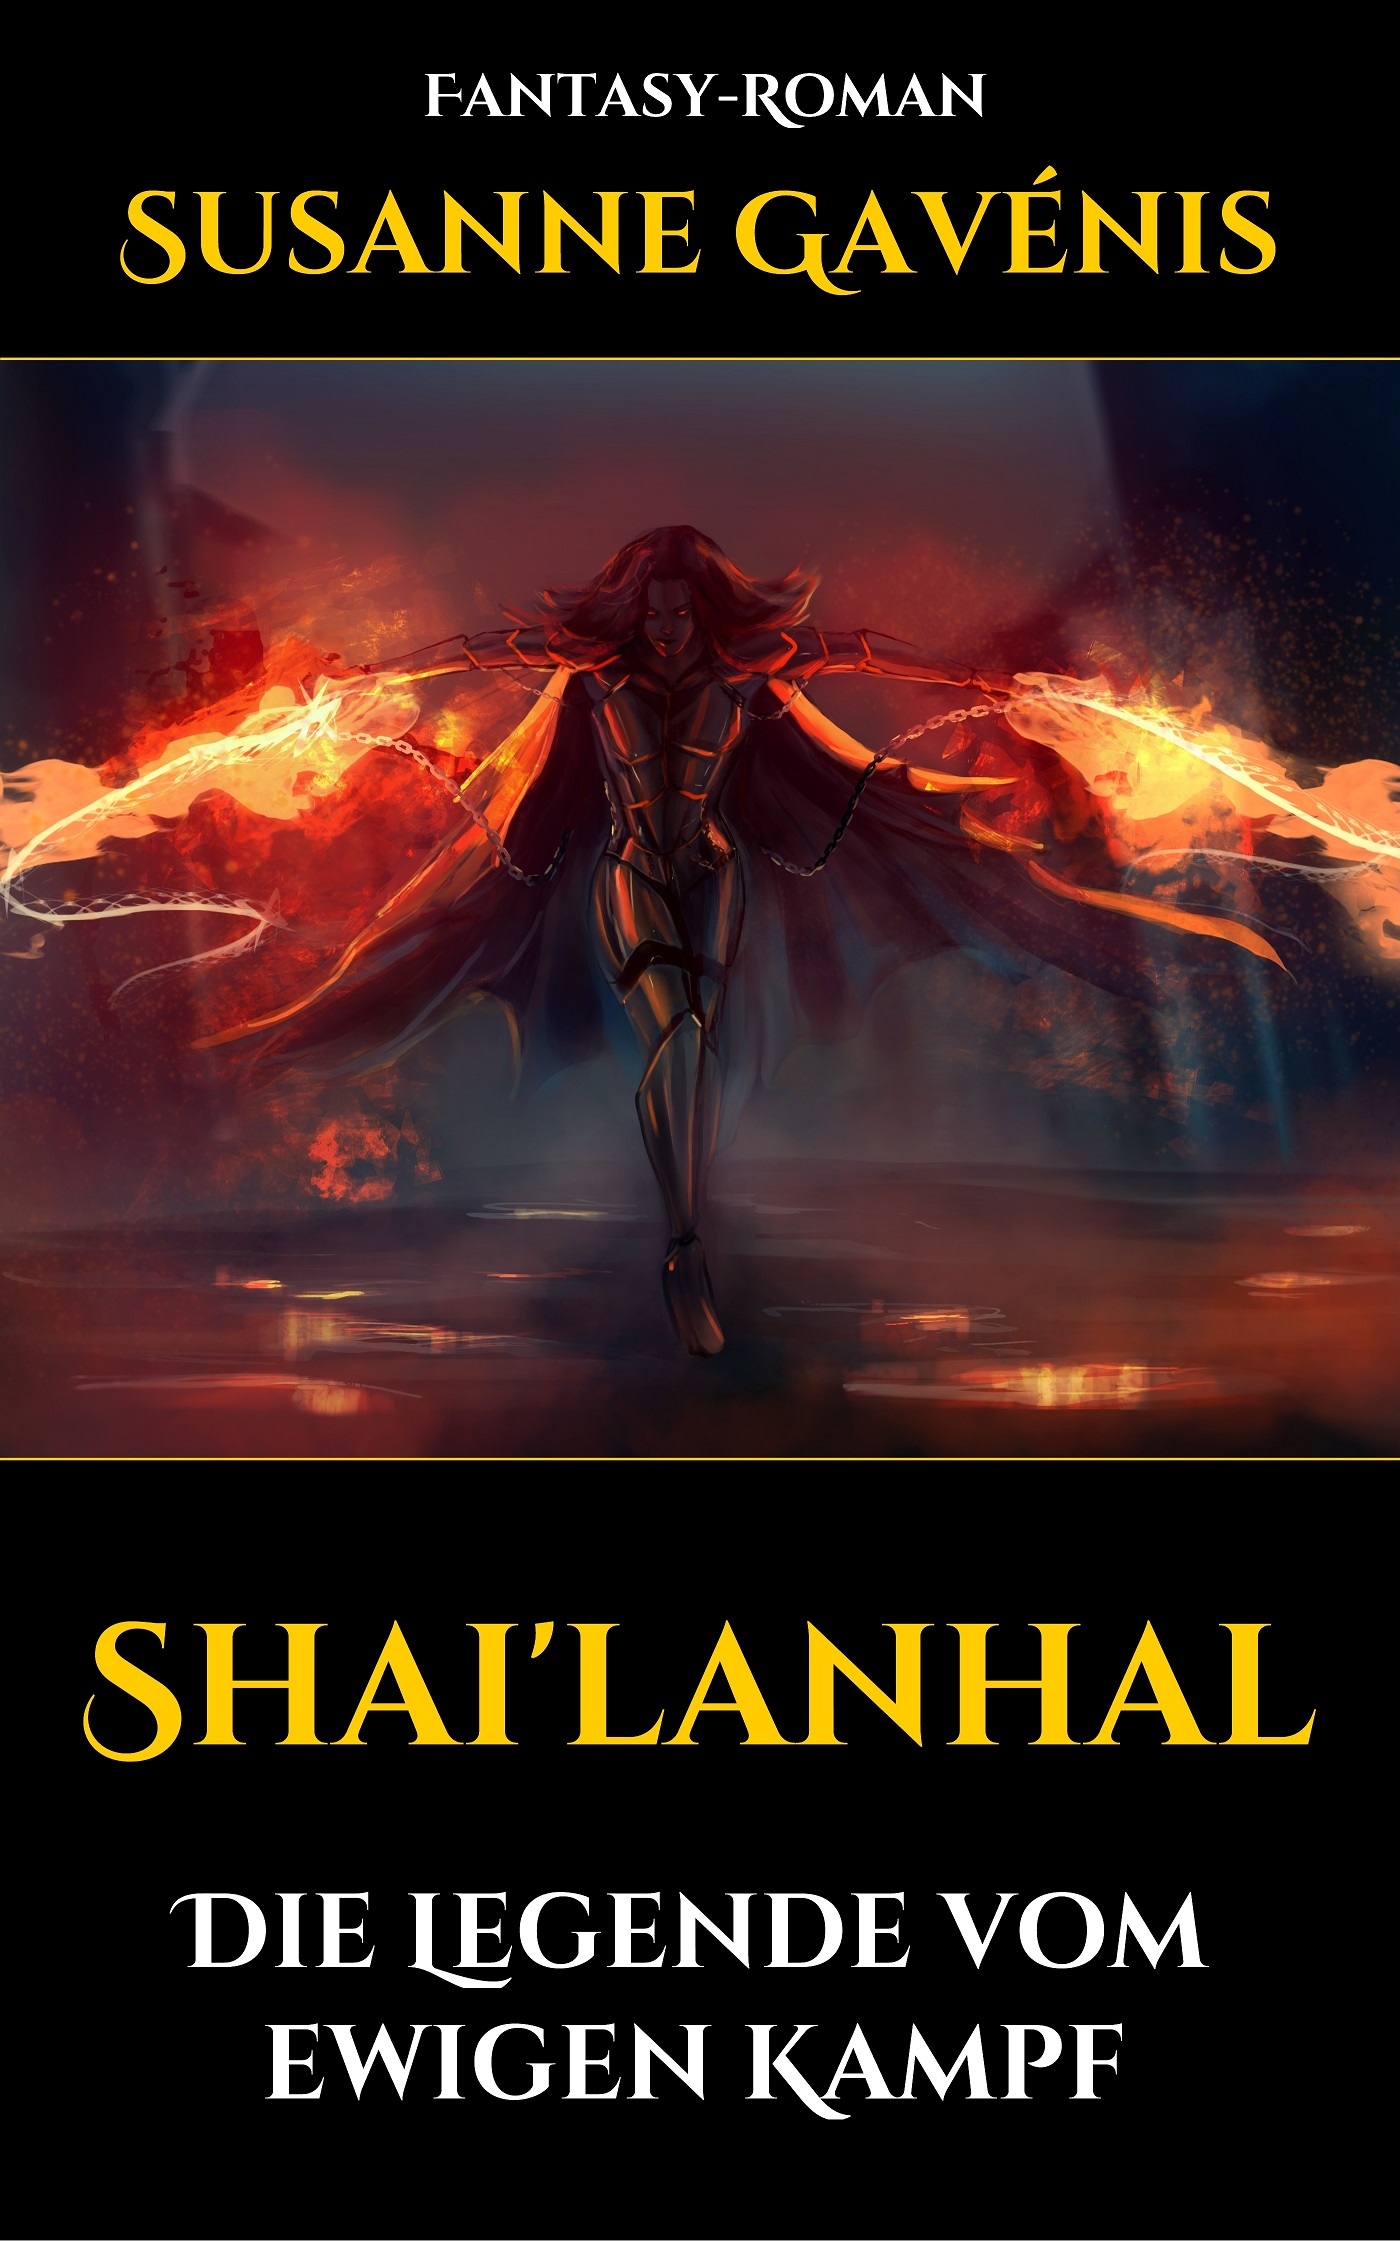 Shailanhal_Galerie